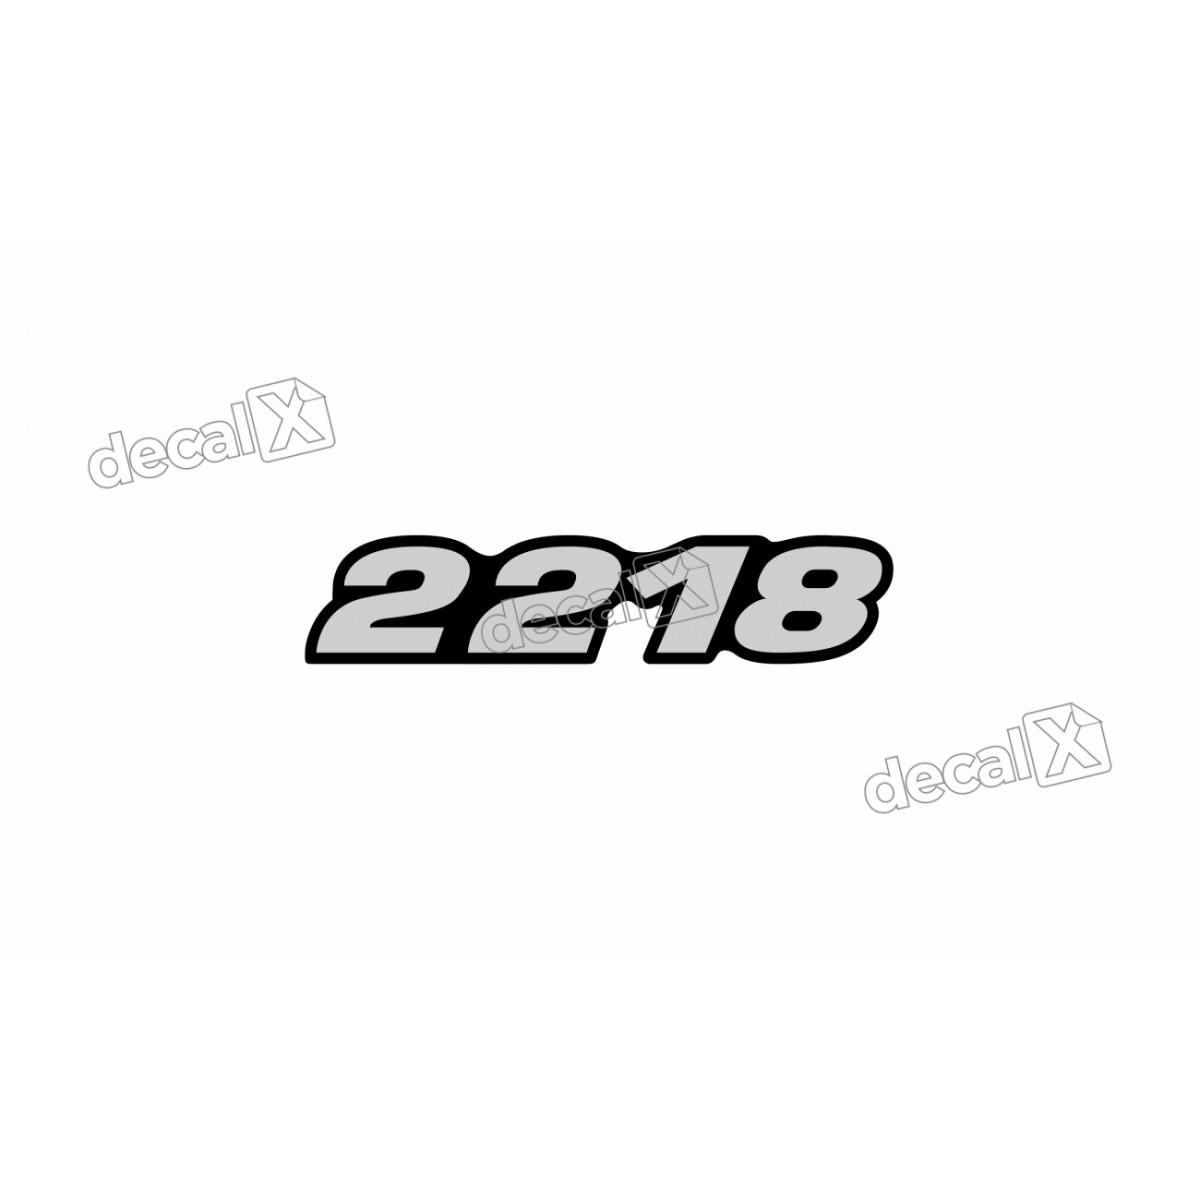 Adesivo Emblema Resinado Mercedes 2218 Cm80 Decalx